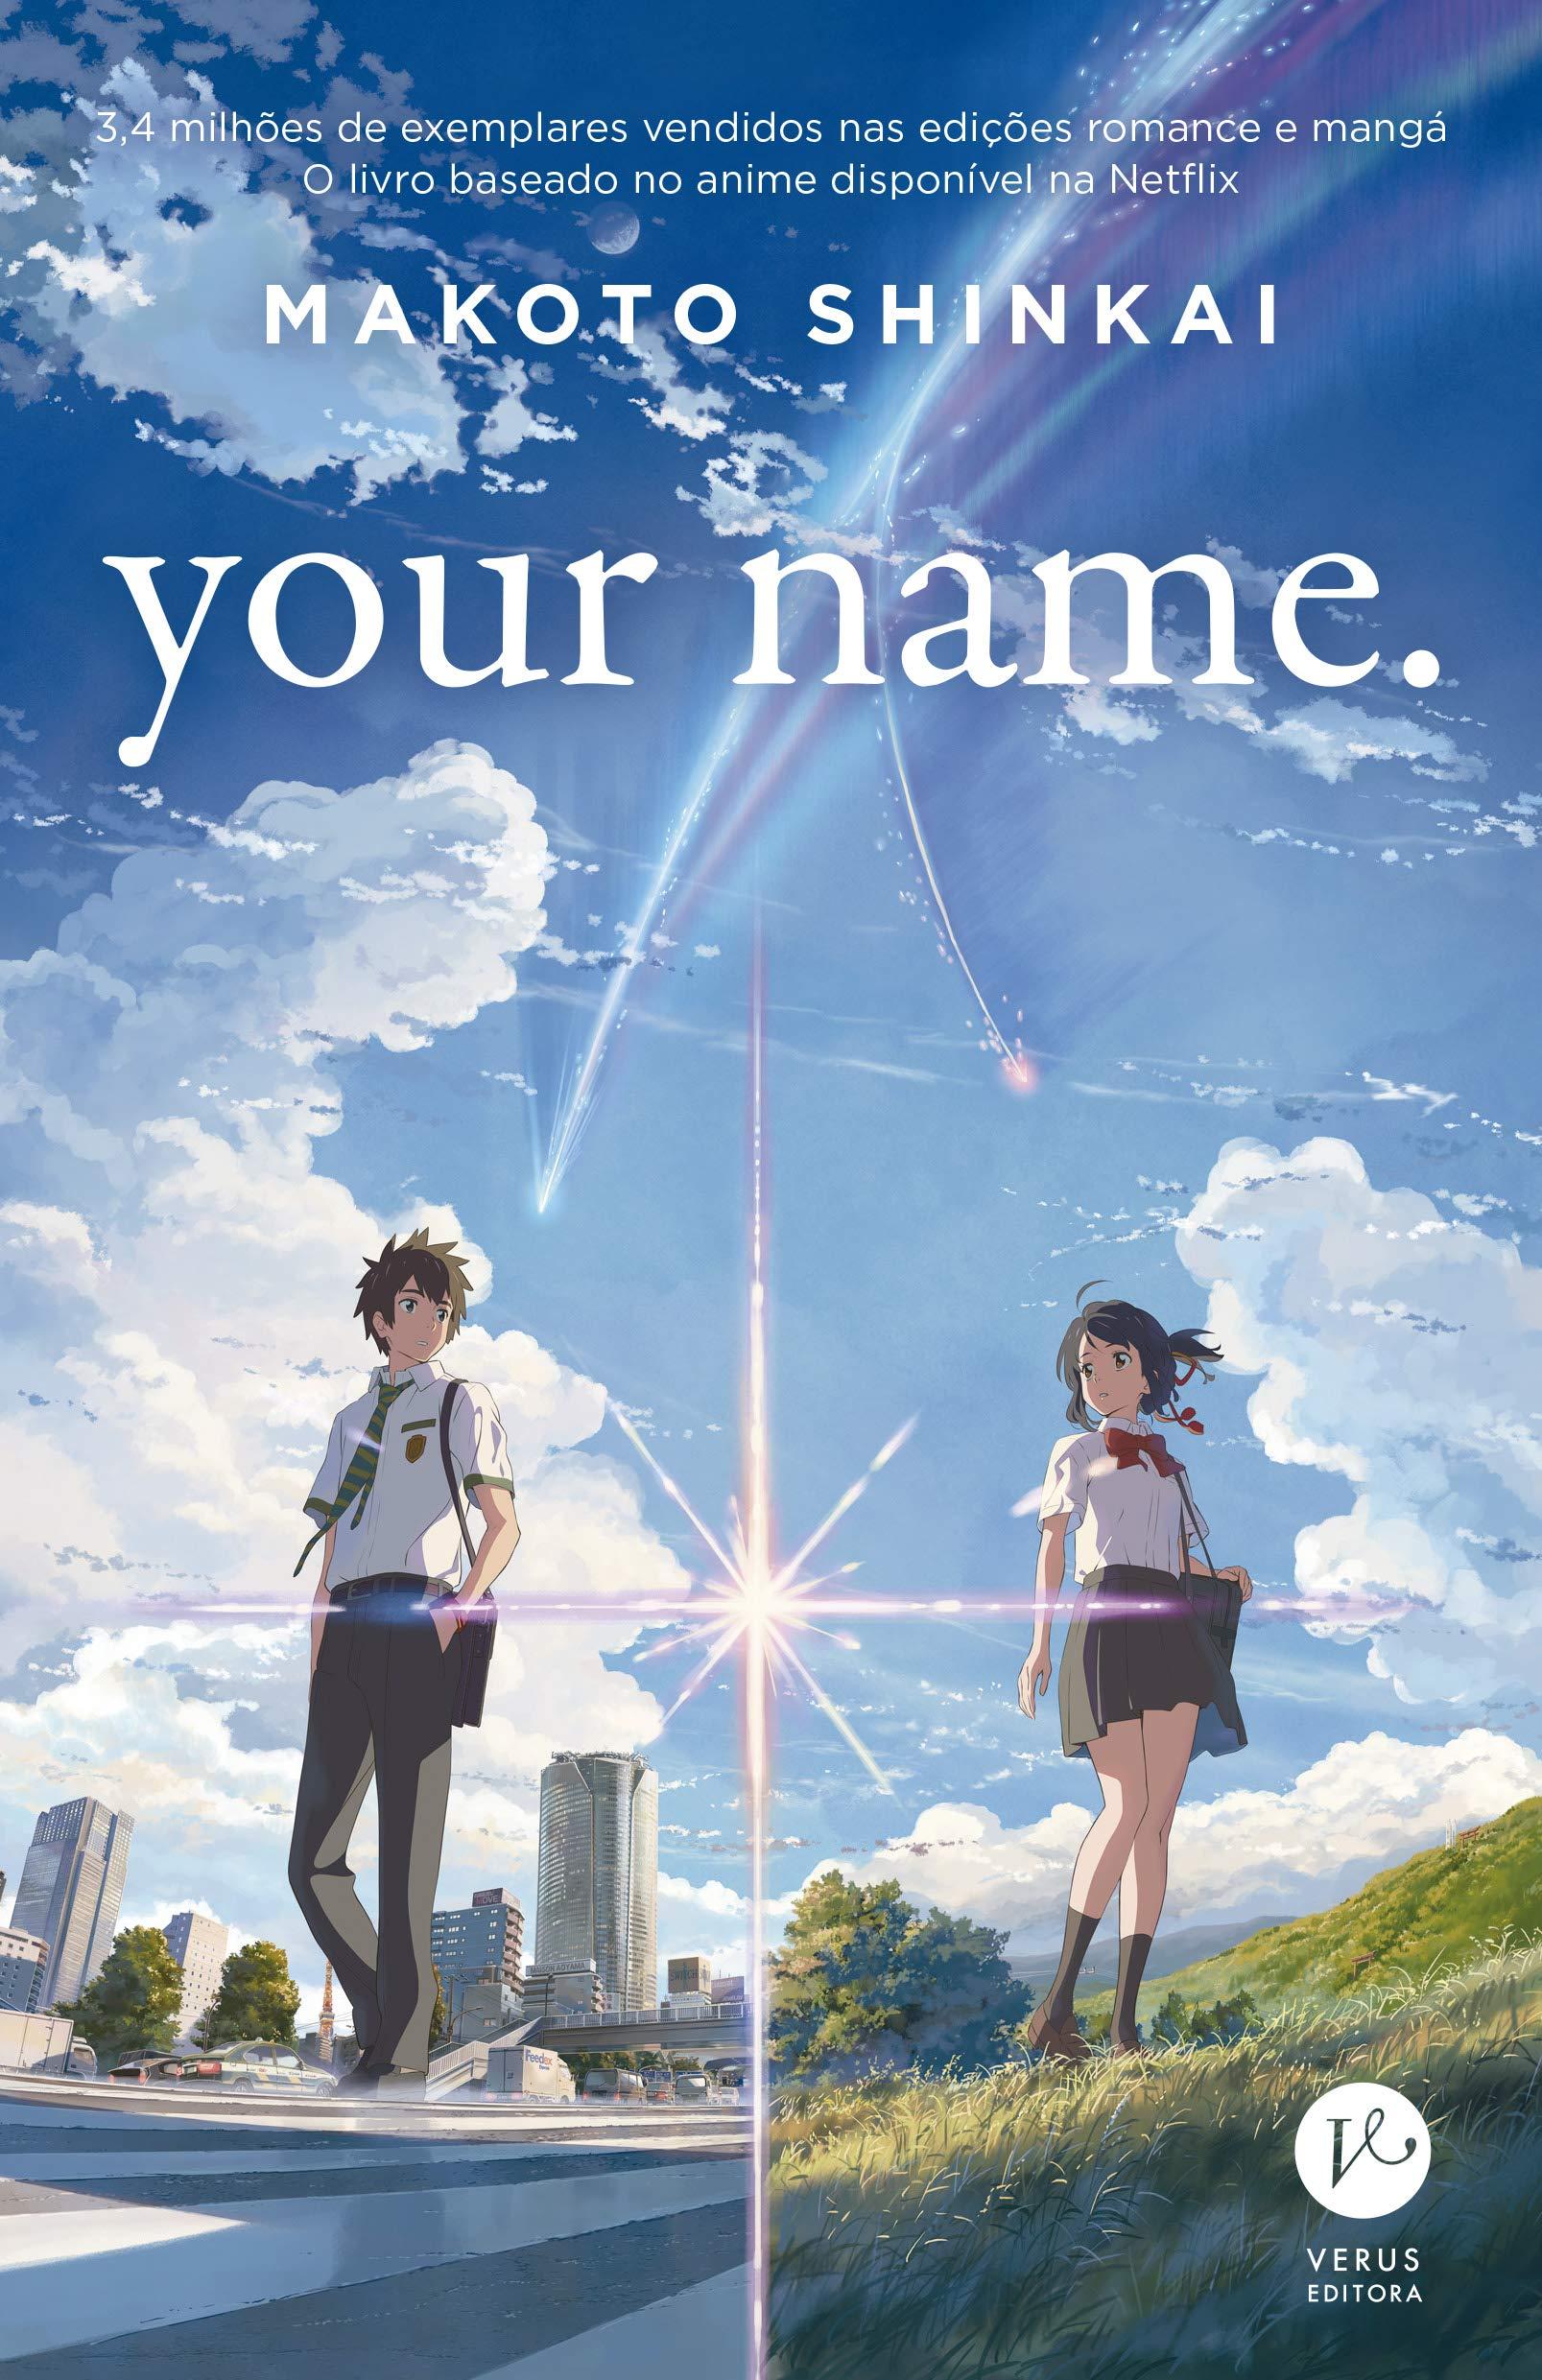 Your name | Amazon.com.br